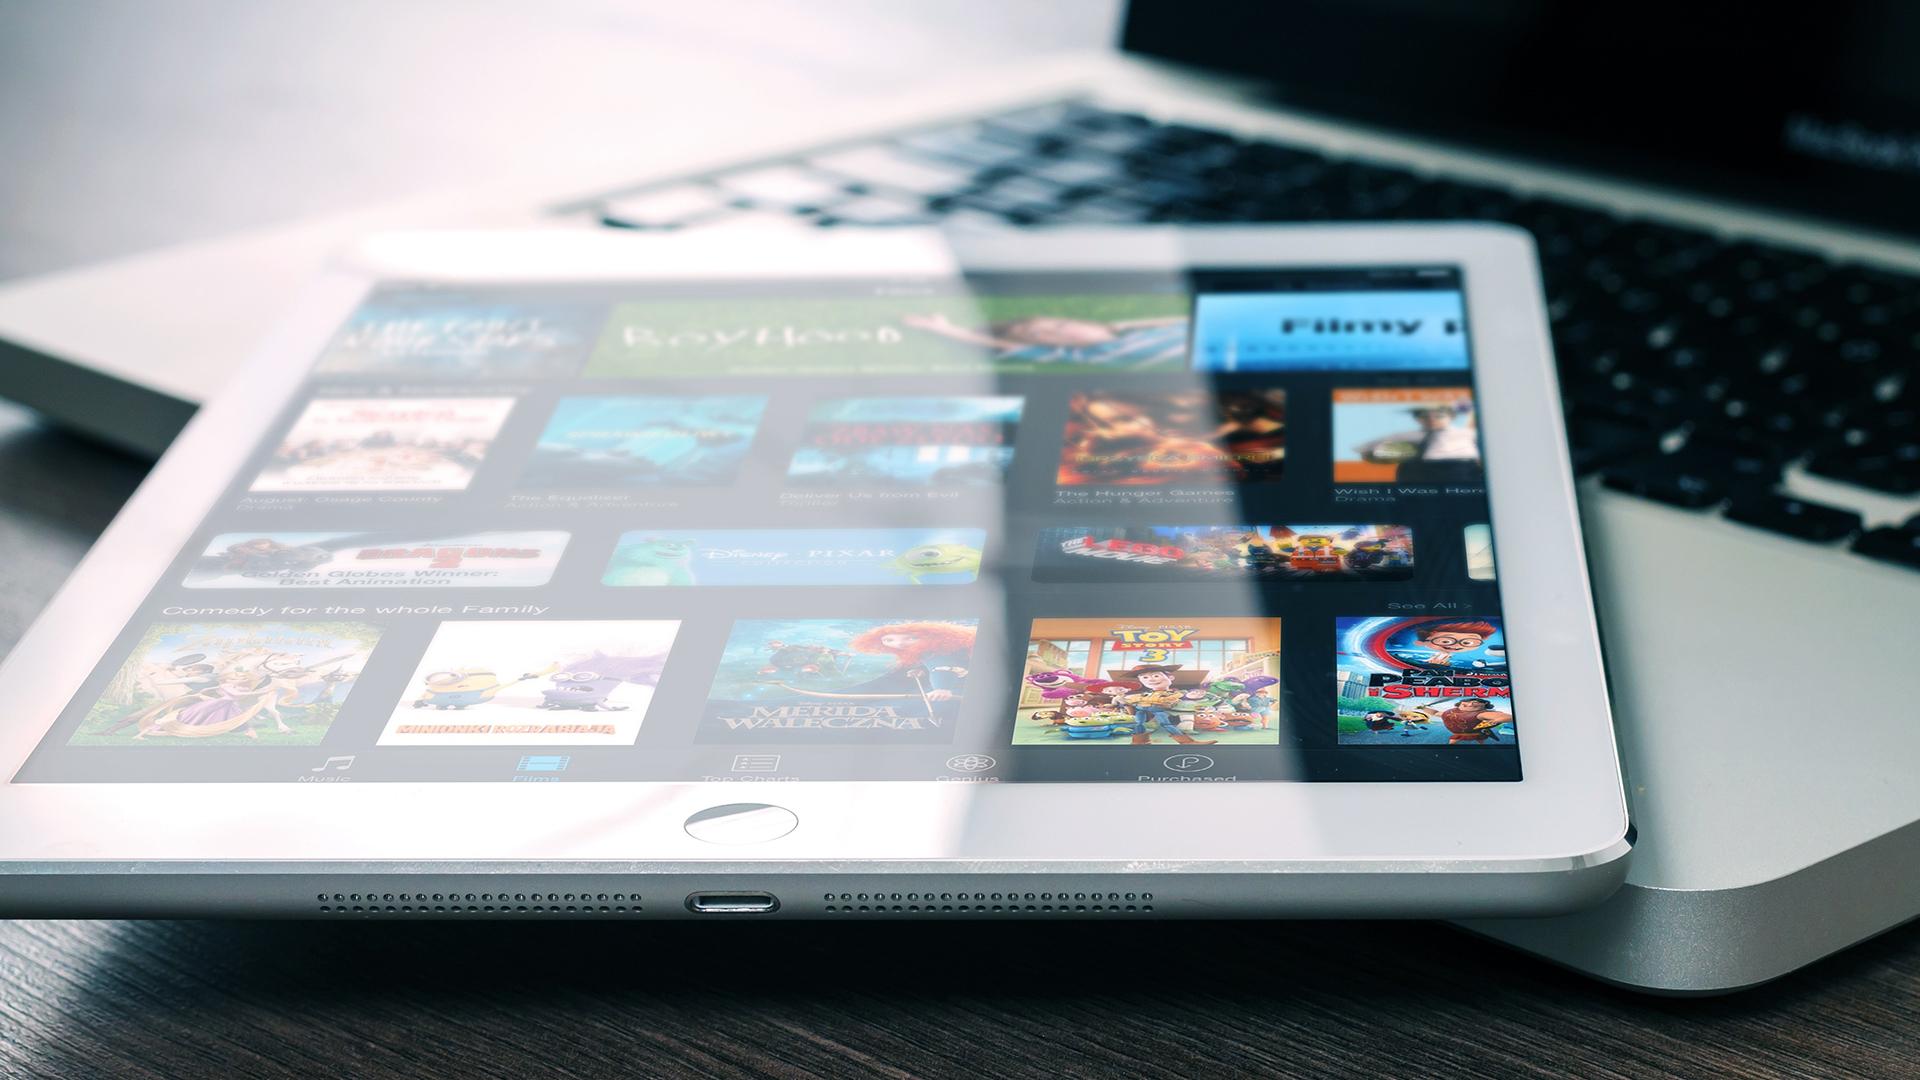 Calvin Carter Talks to 680 News About Netflix Q4 Results